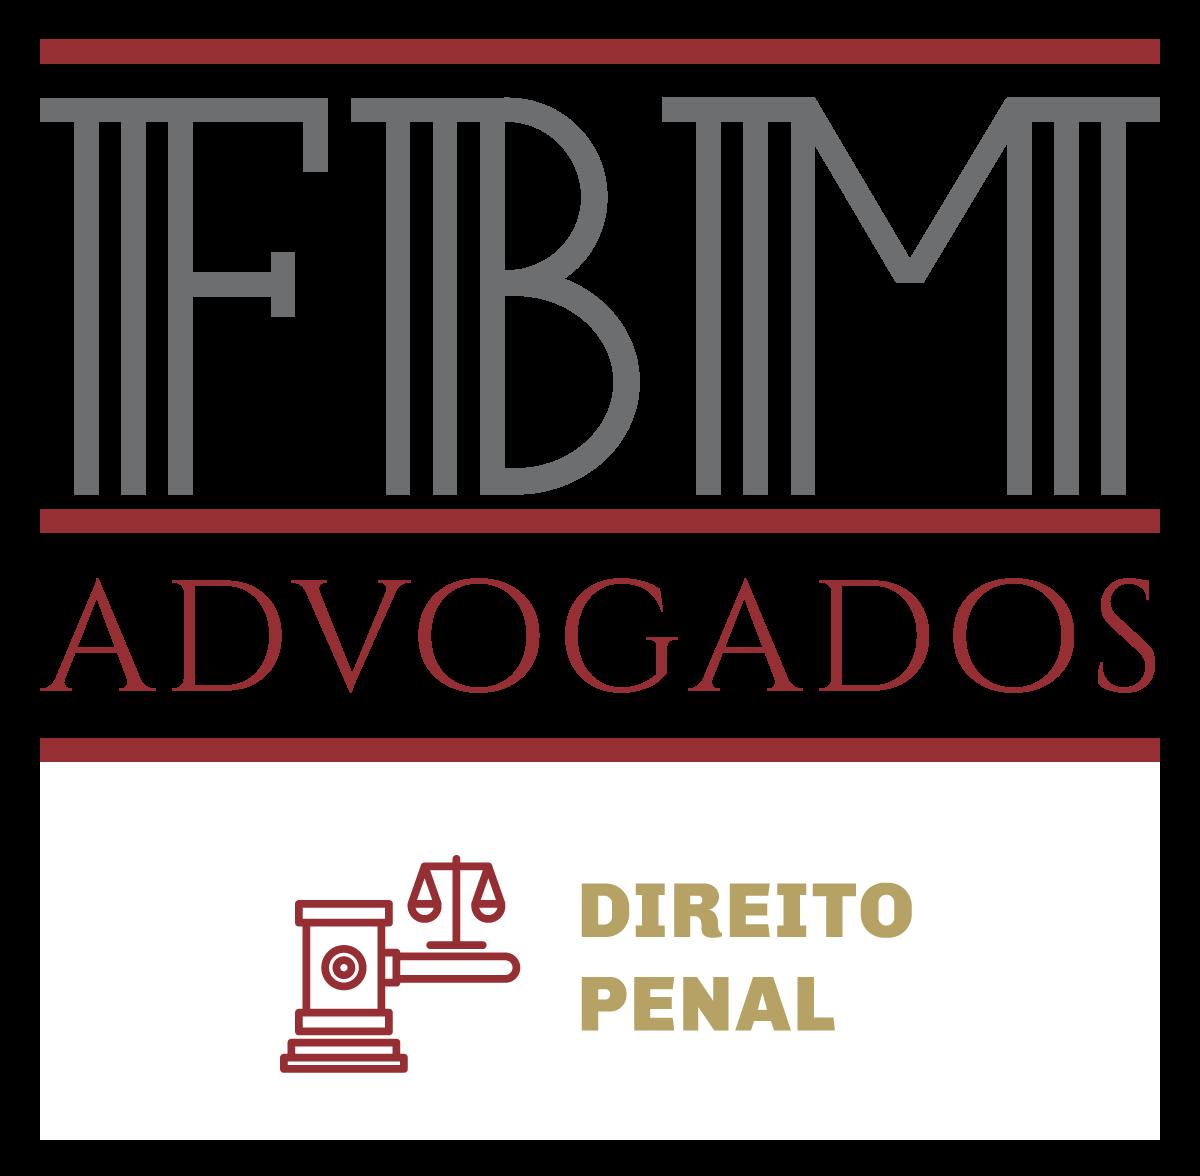 Advogados Direito Penal